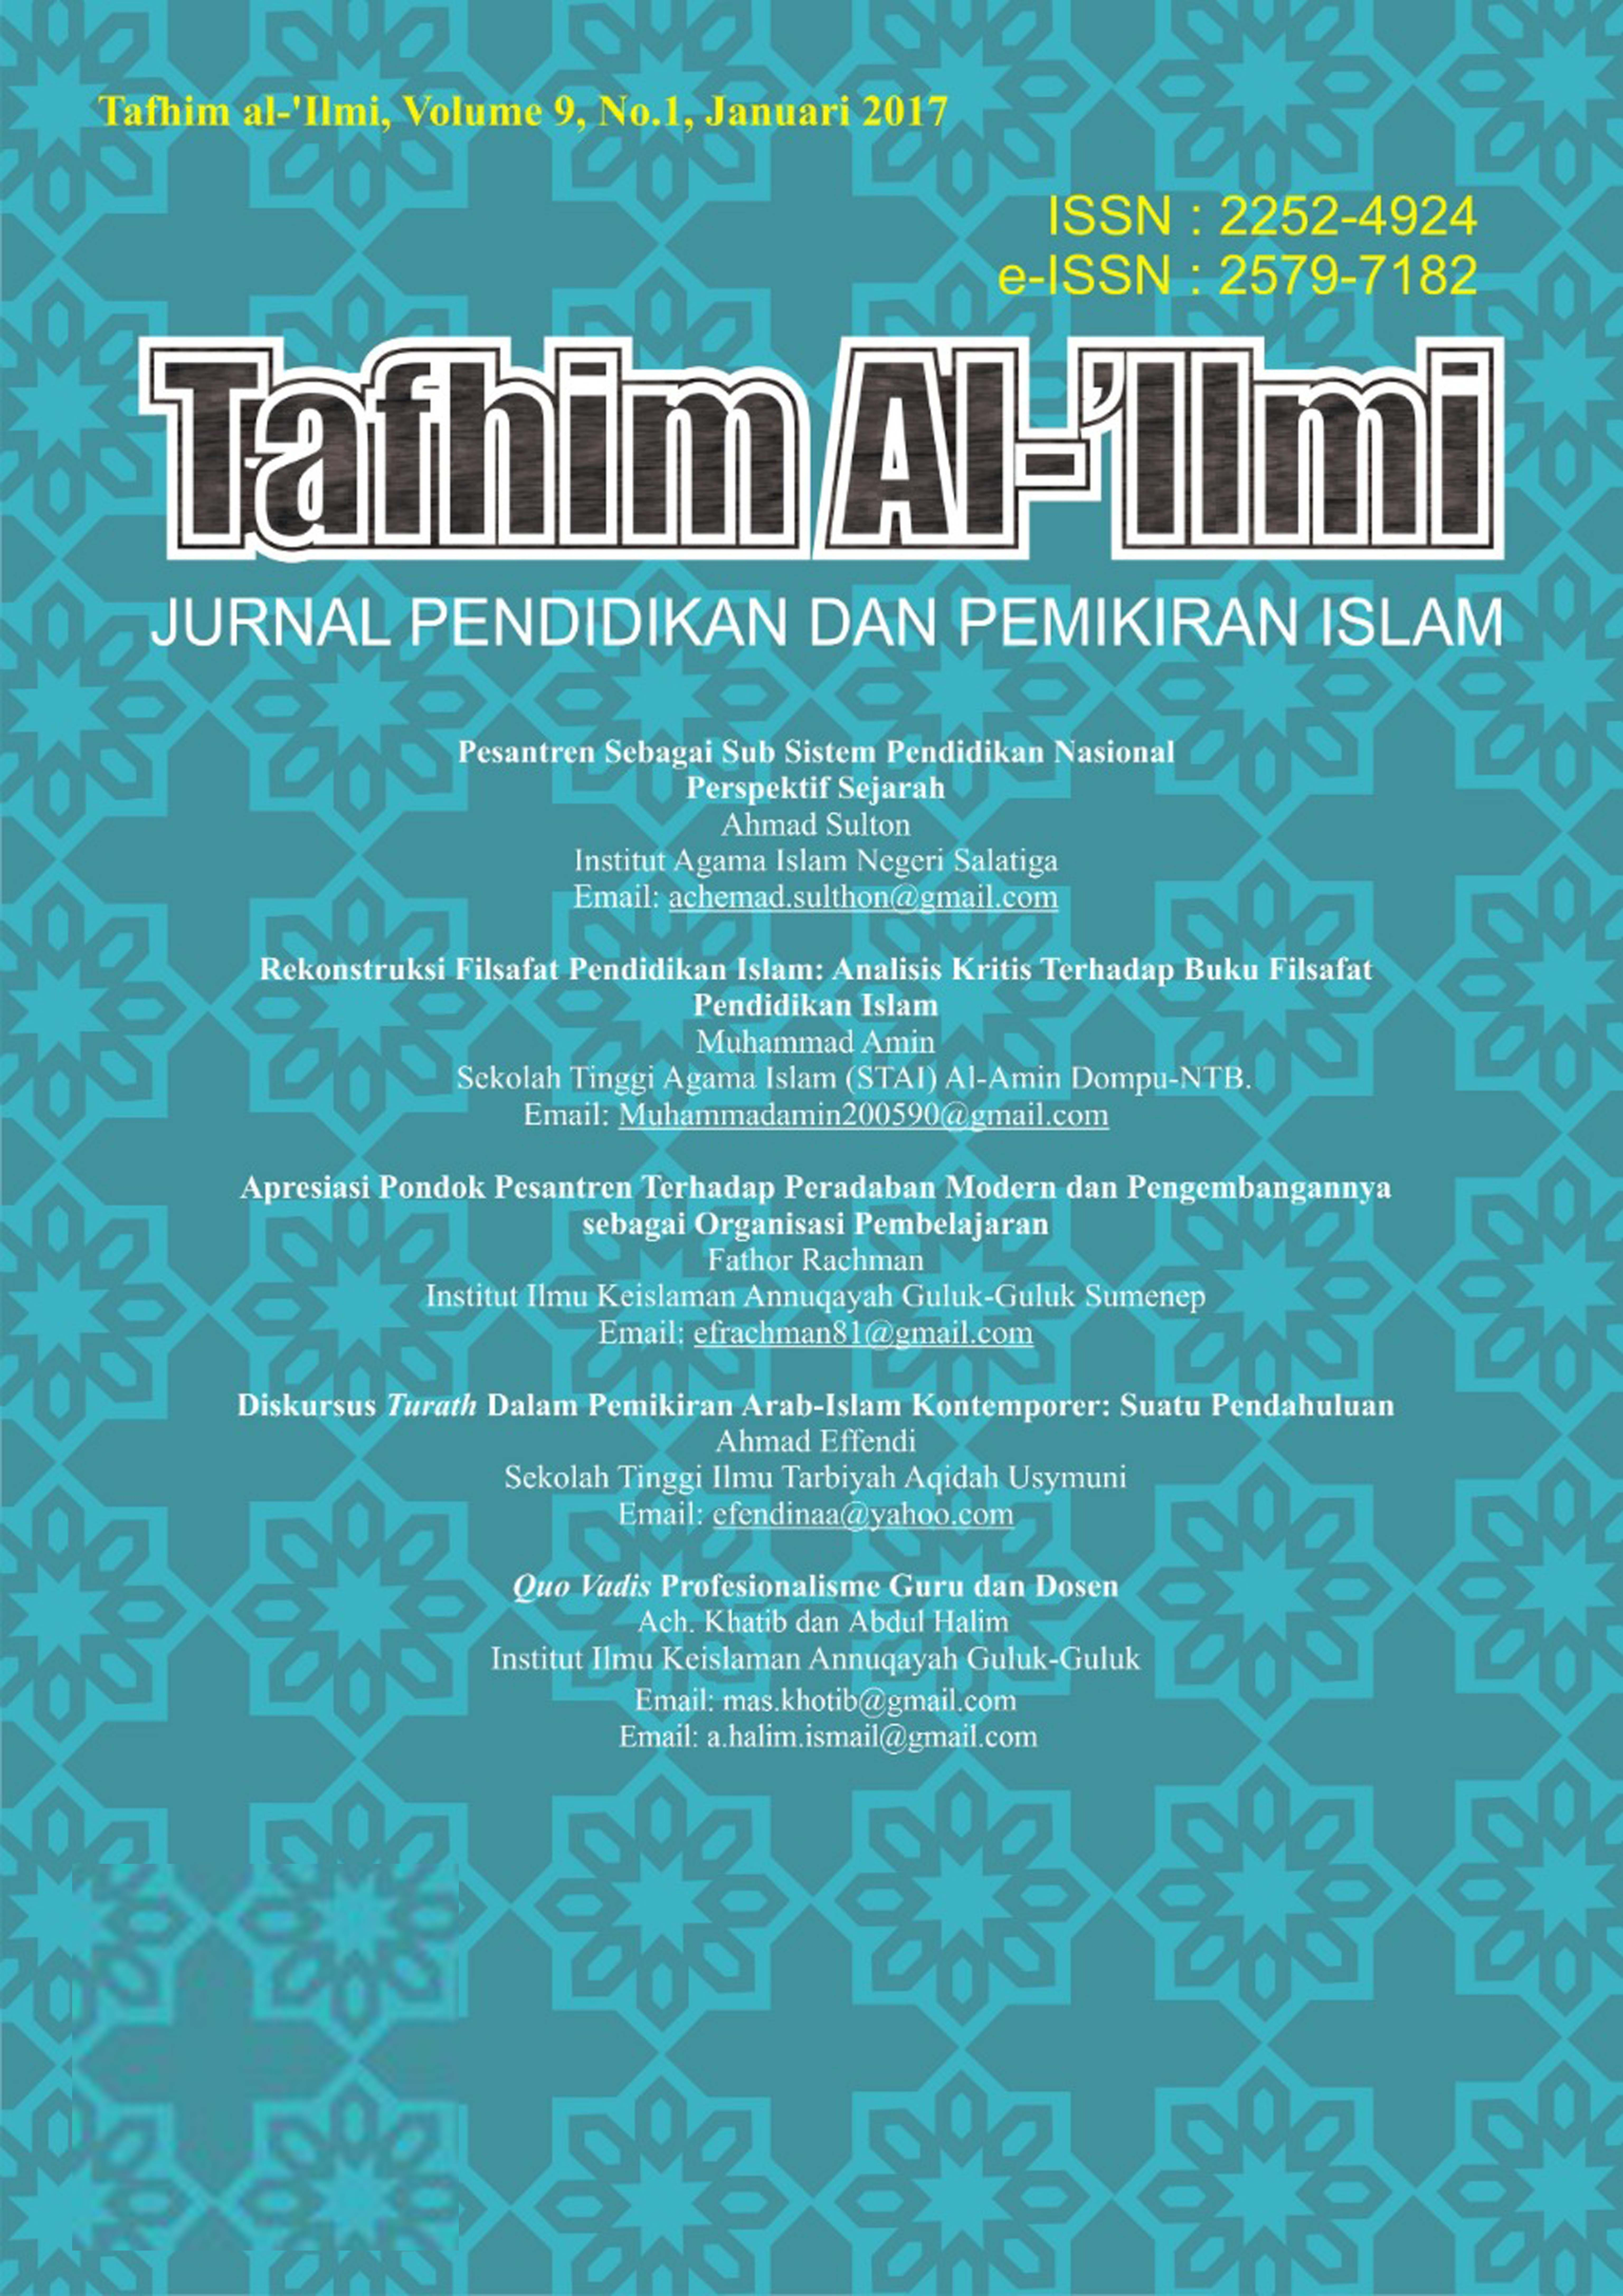 jurnal tafhim al-'ilmi